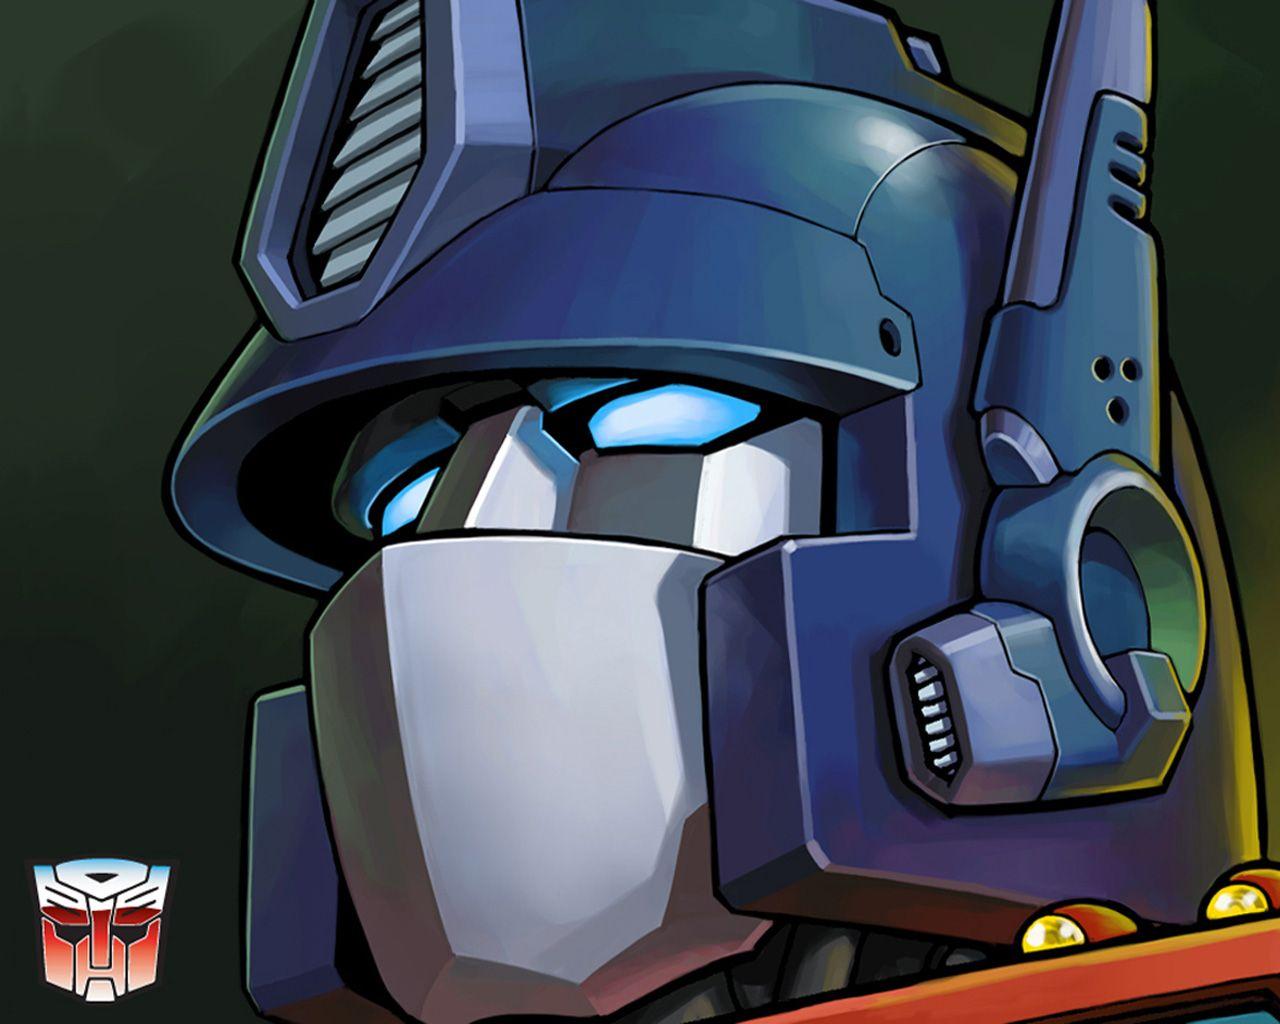 optimus prime head - Google Search   How to draw tutorials ...  optimus prime h...